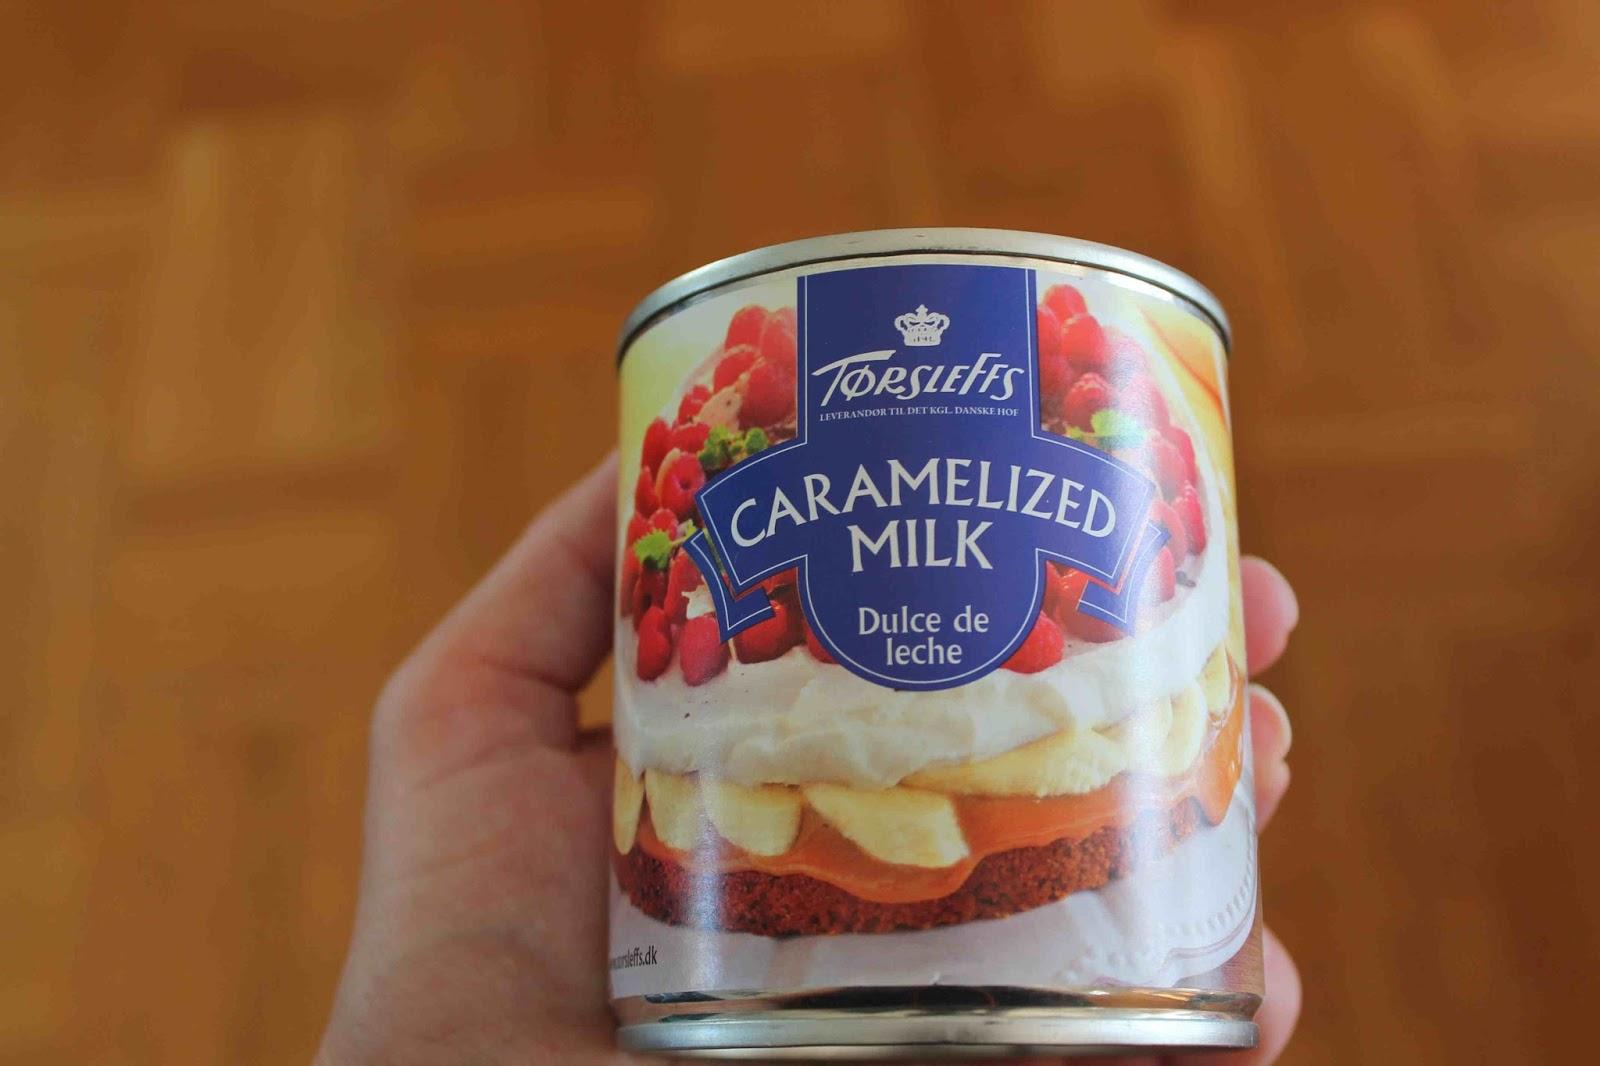 Kolasås karamelliserad mjölk